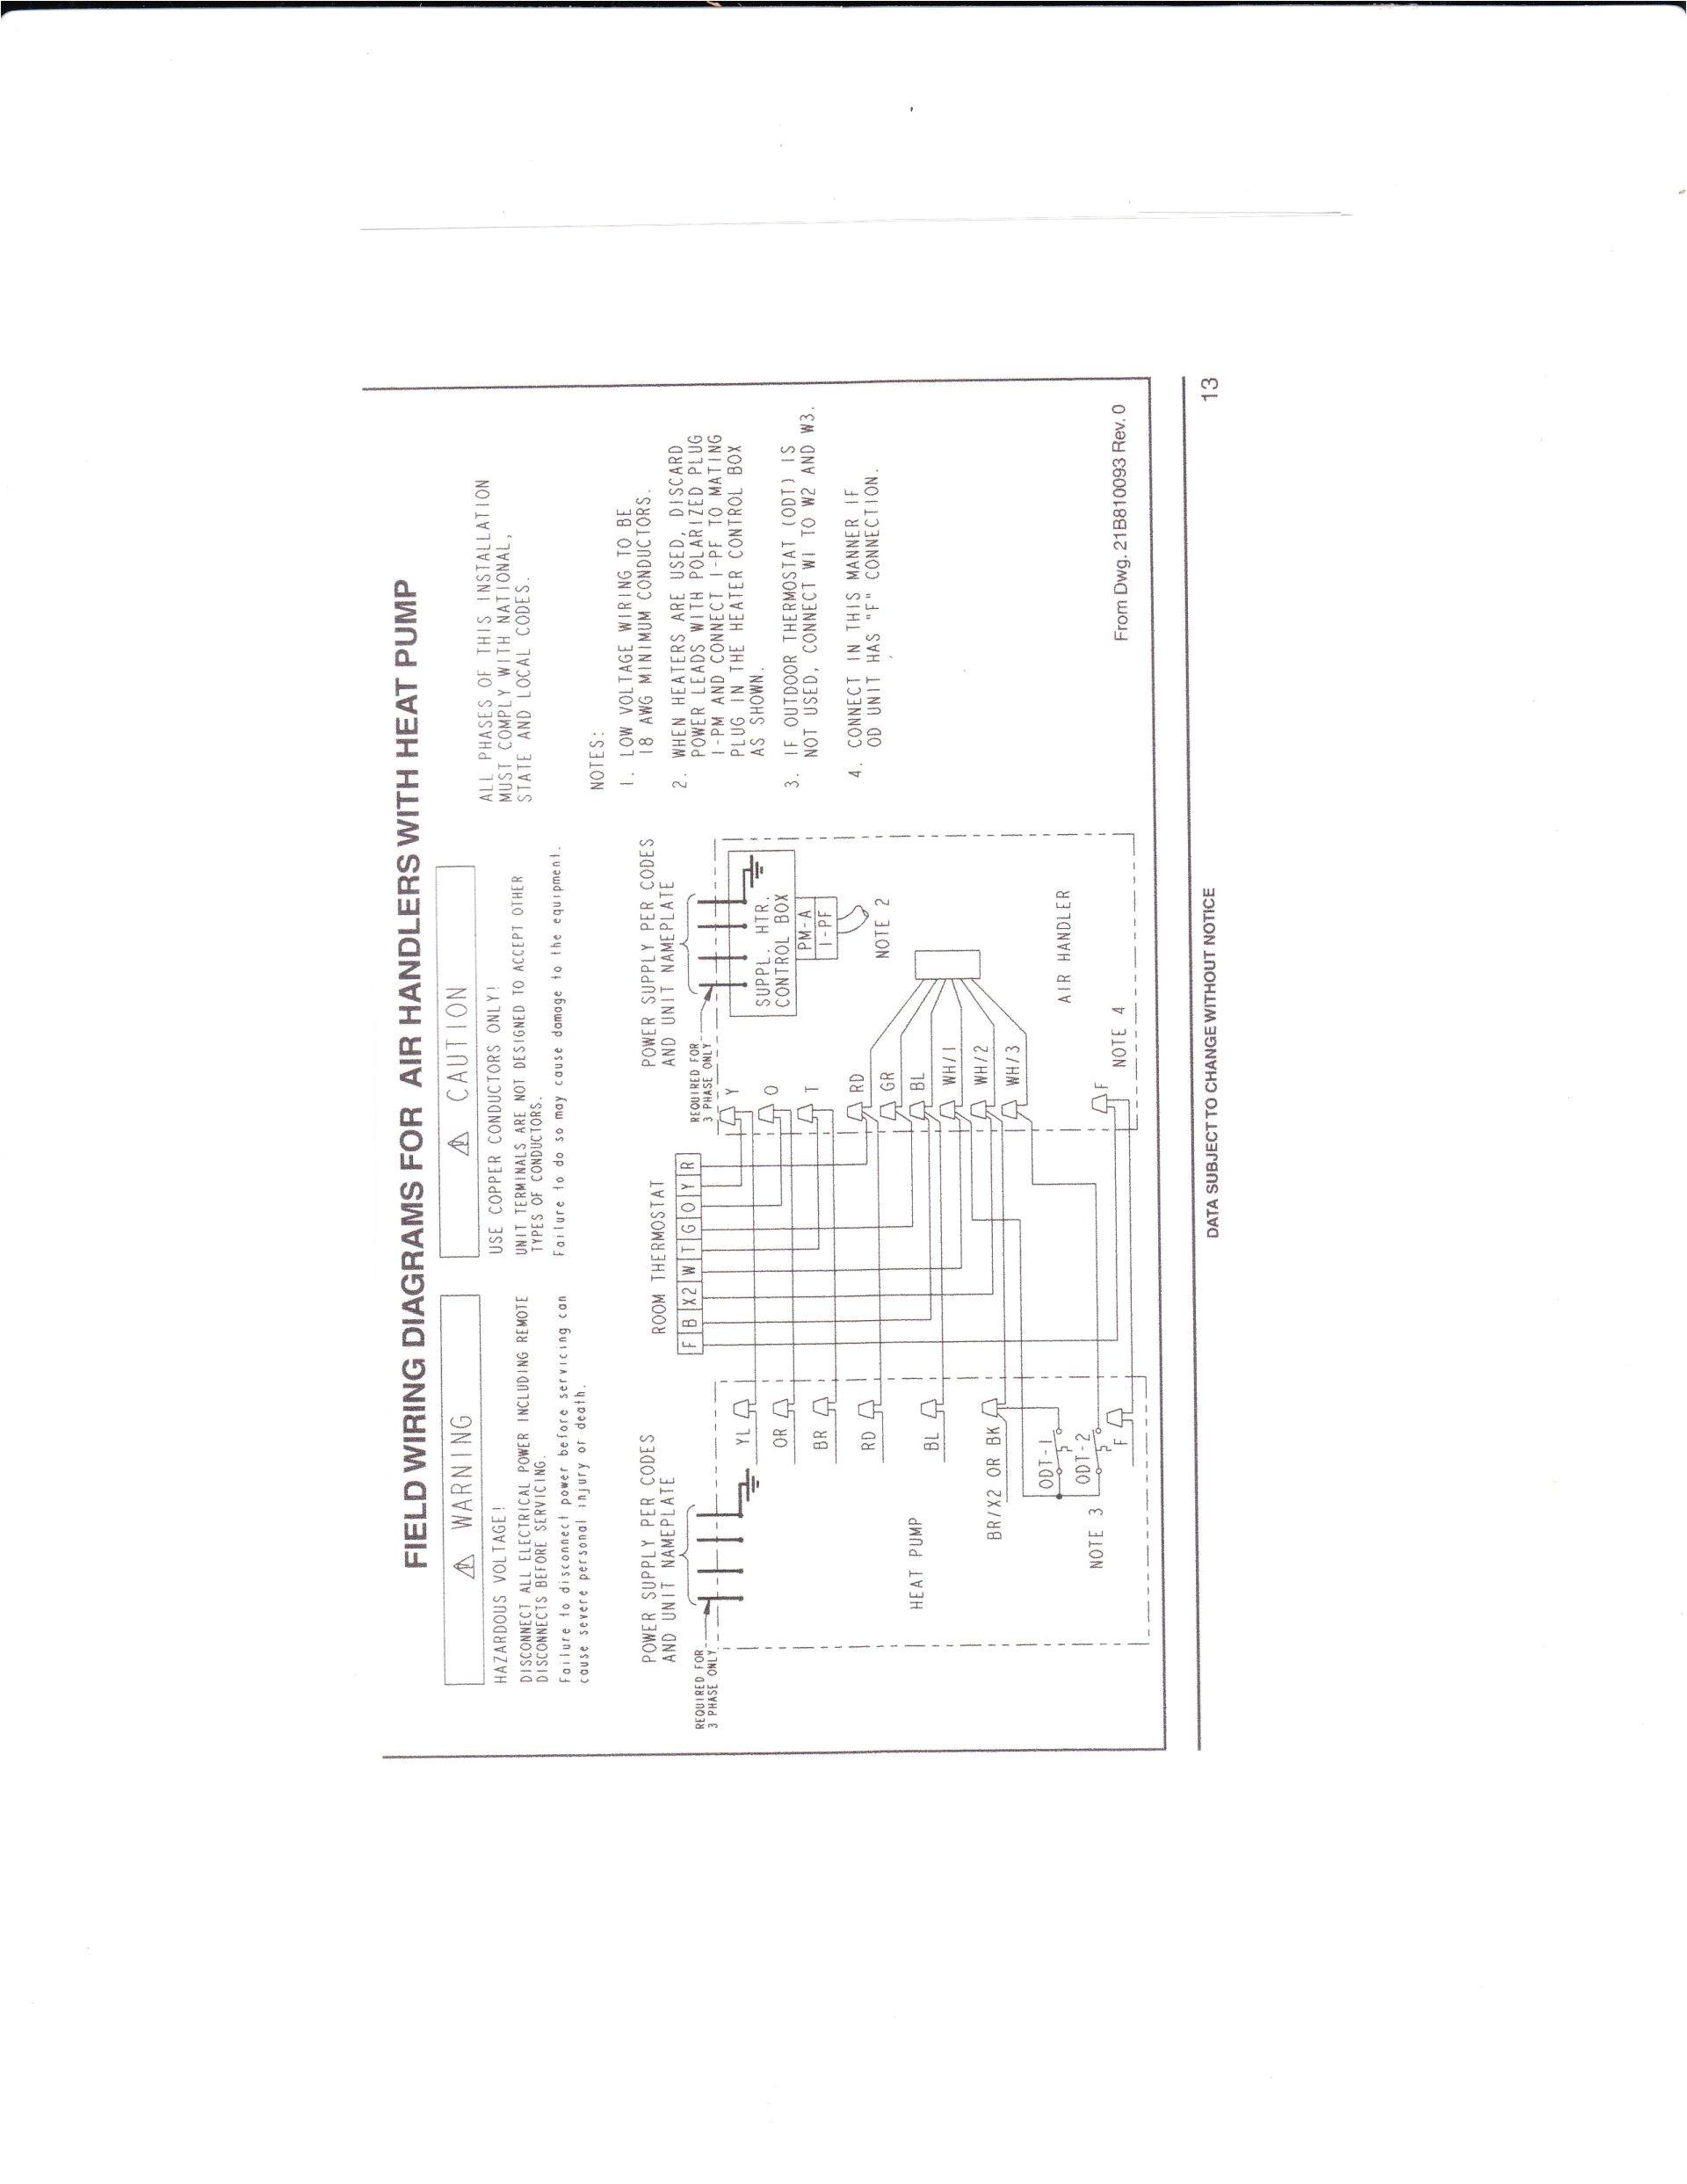 standard heat pump thermostat wiring diagram for